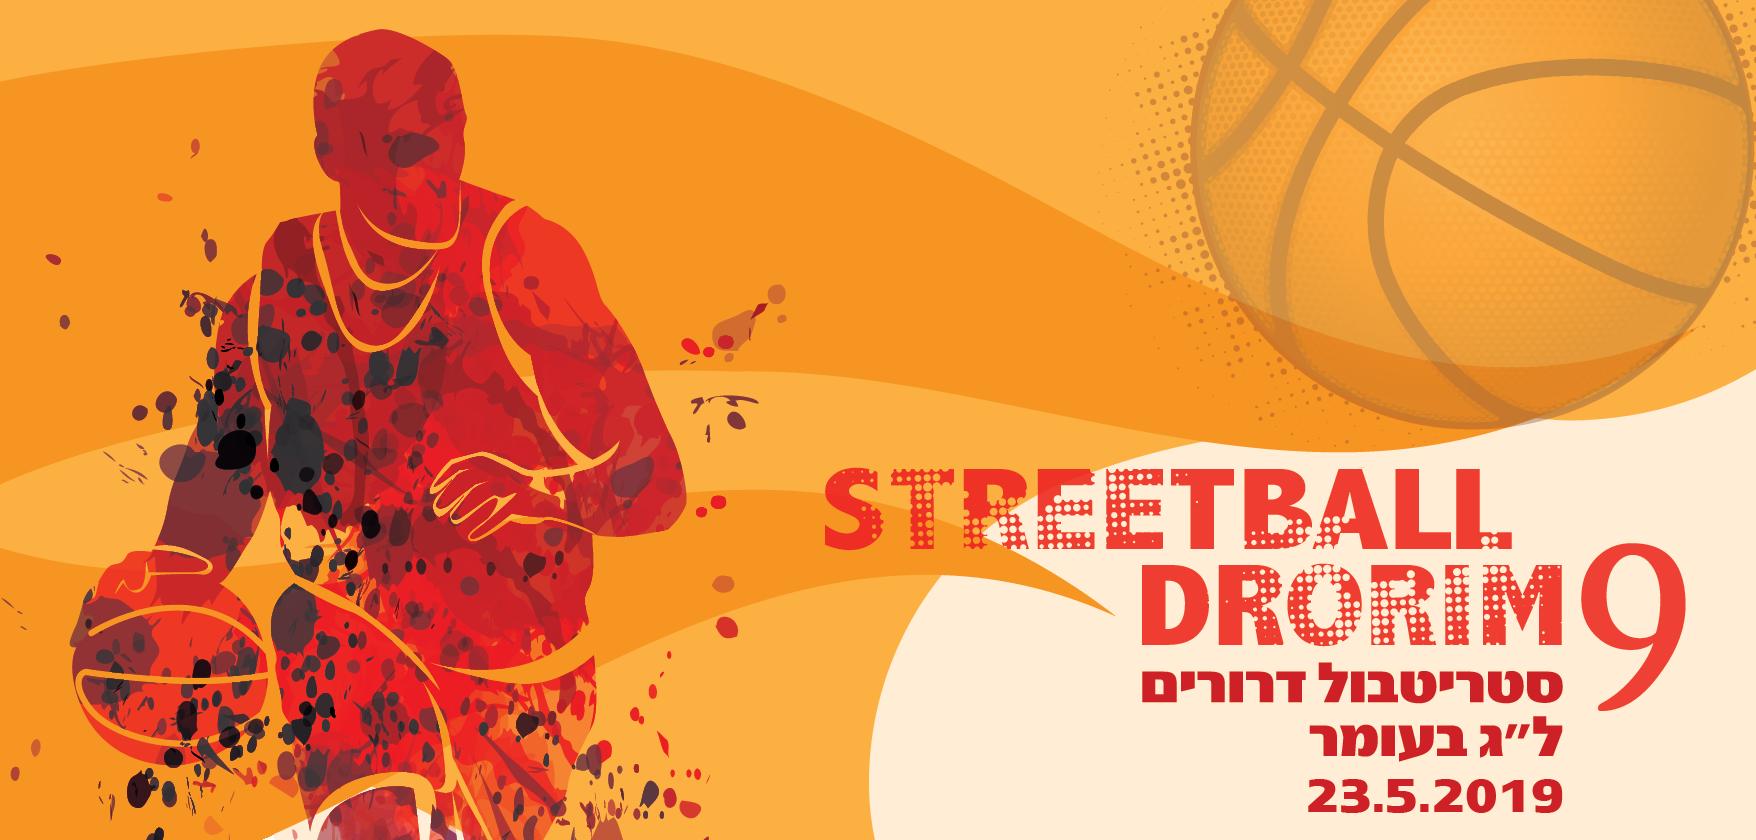 facebookB-streetball2019-01